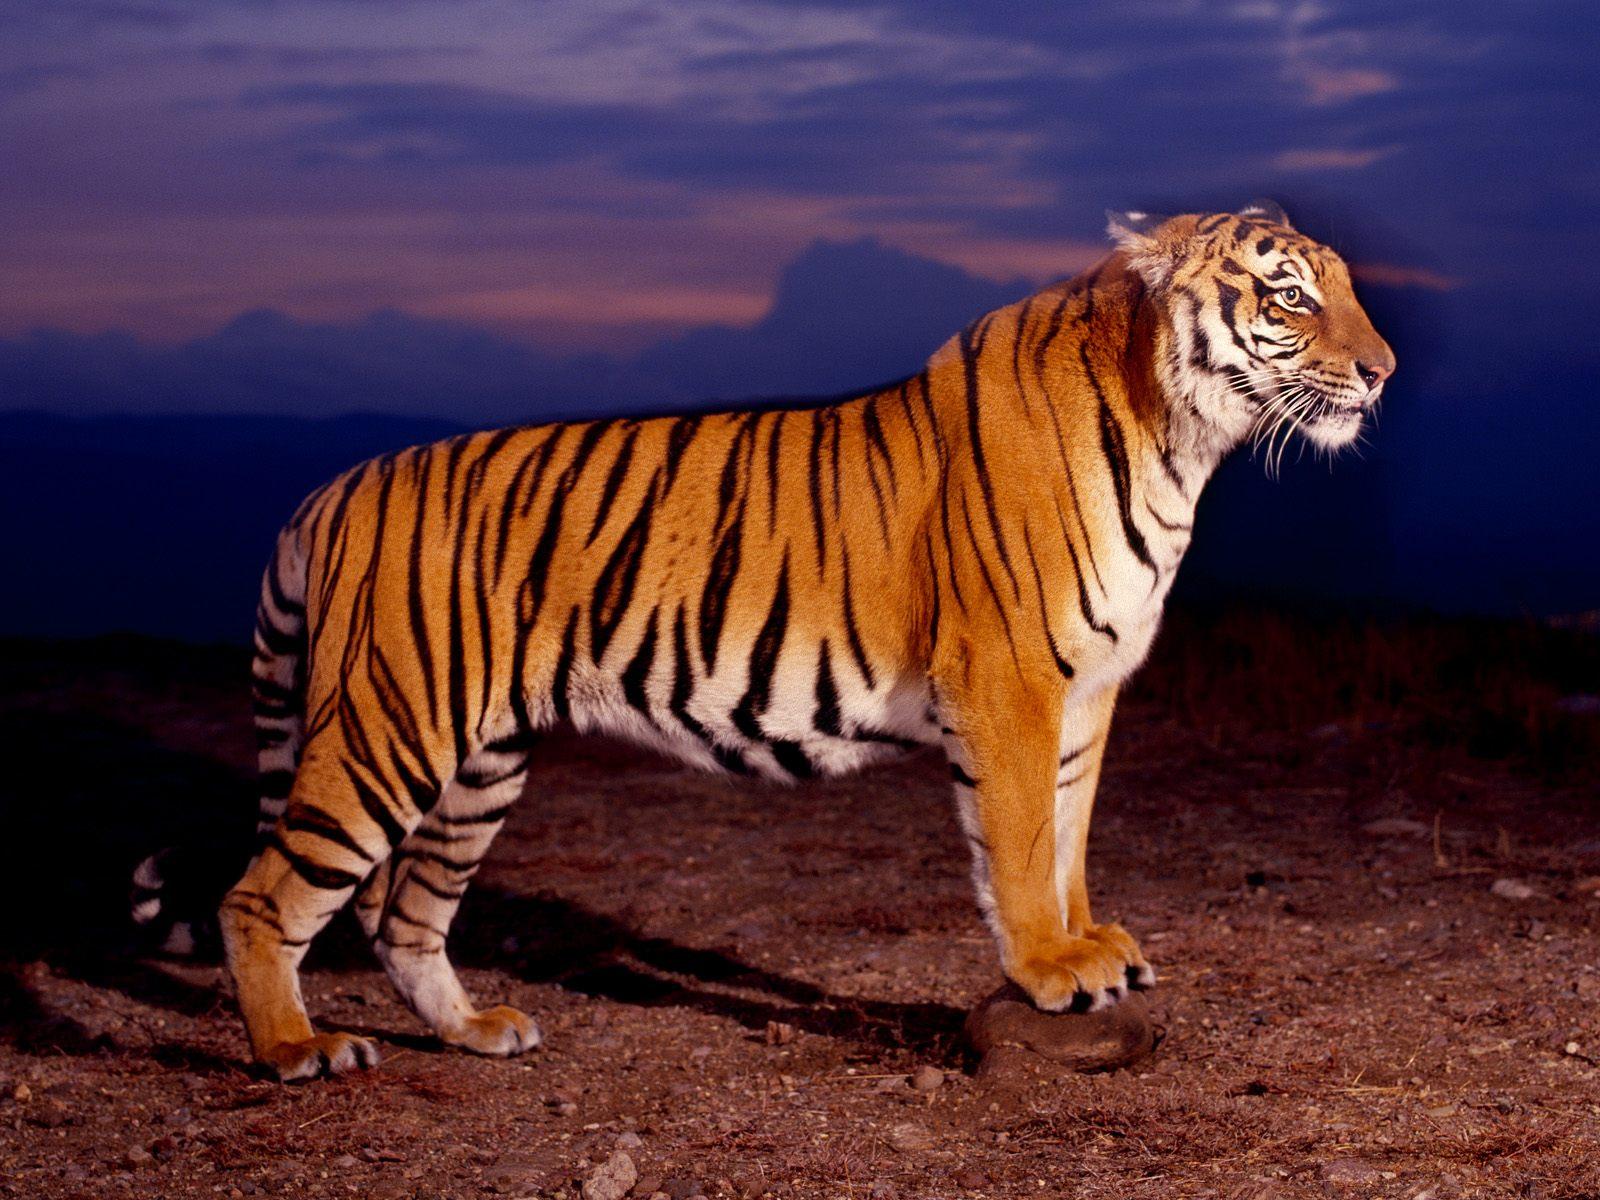 white tiger,beautiful tiger,hd tiger images,sleeping tiger high